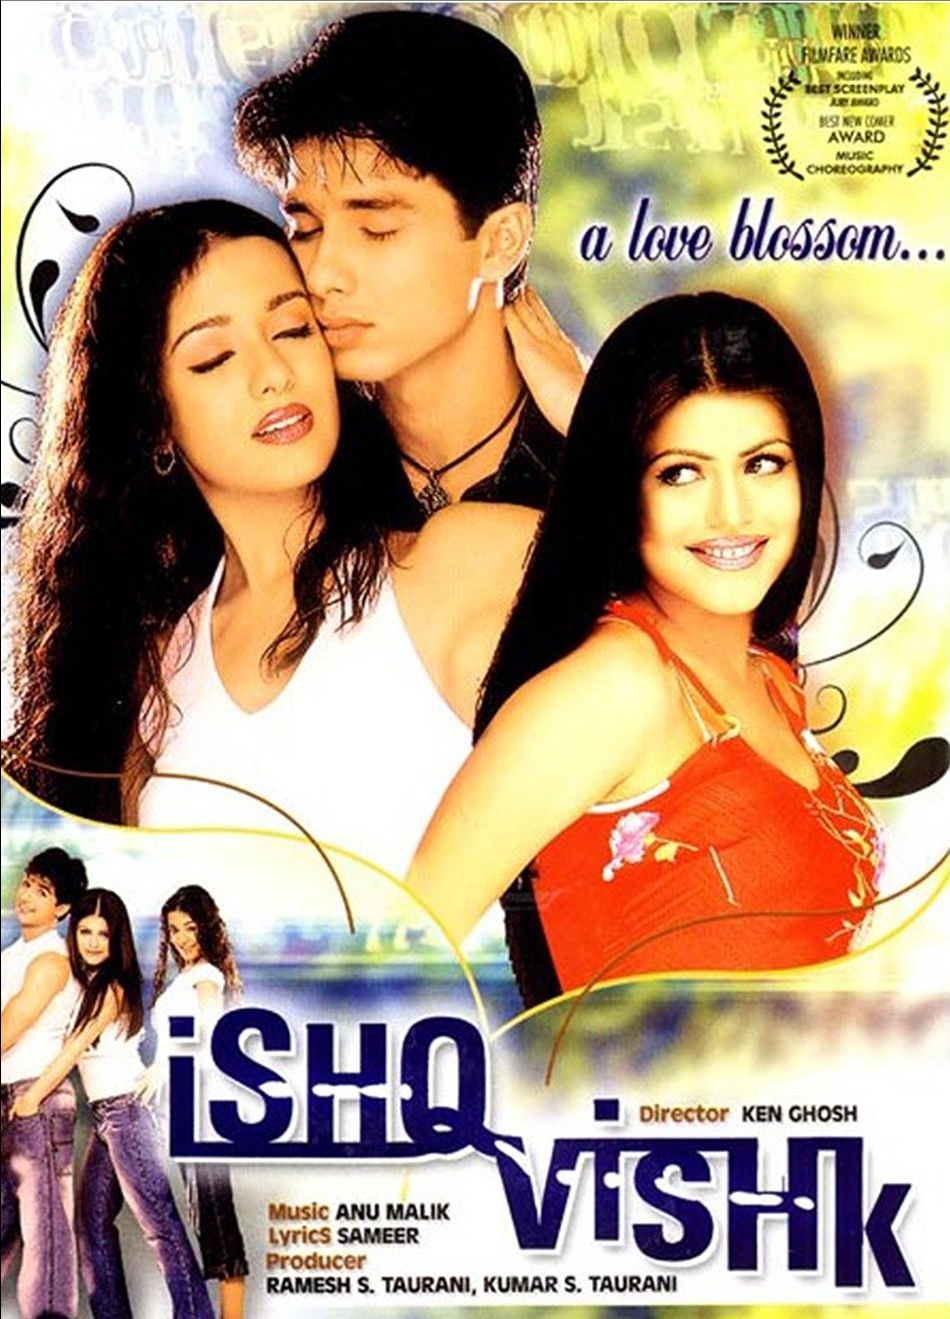 Shahid Kapoor Film: Ishq Vishq (2003)